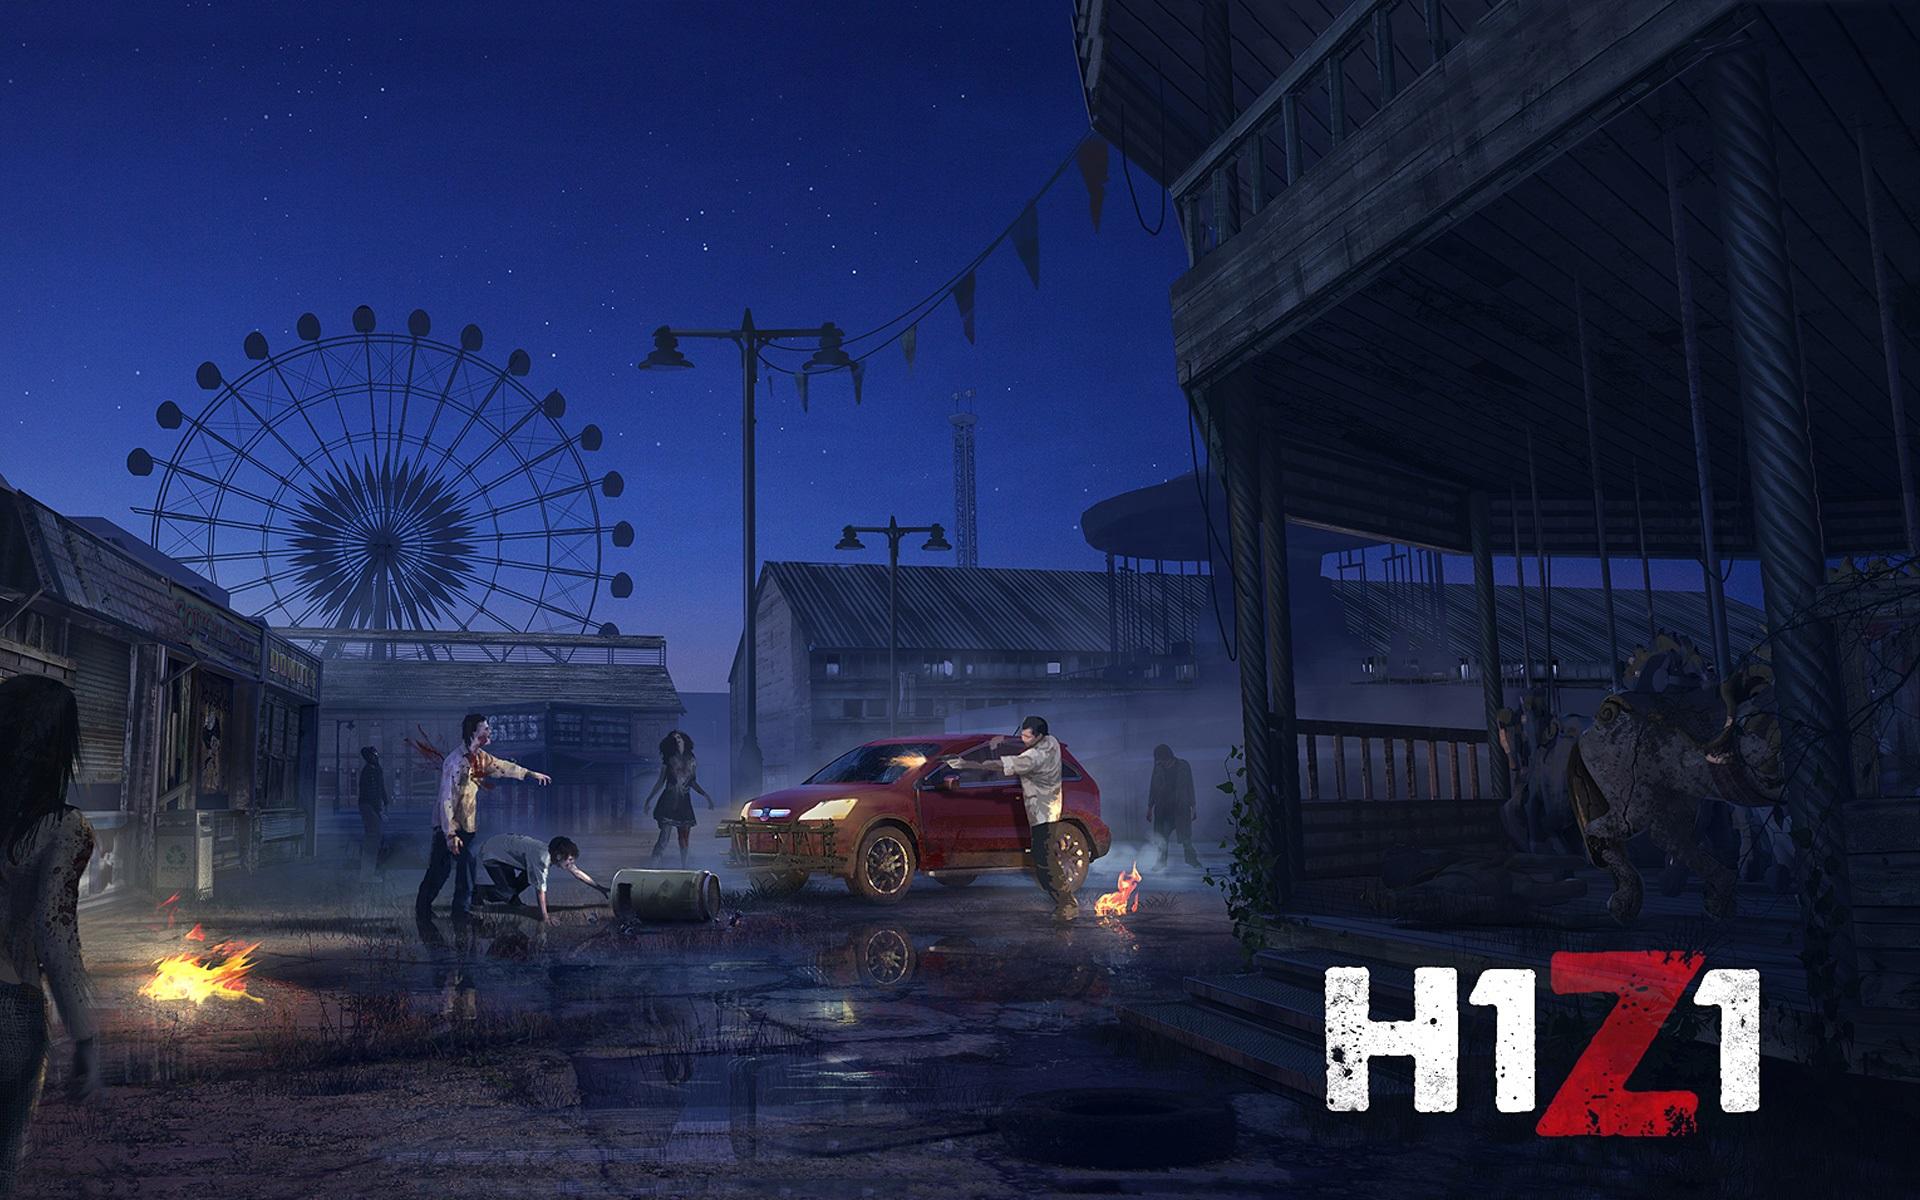 壁紙 H1z1のpcゲーム 19x10 Hd 無料のデスクトップの背景 画像